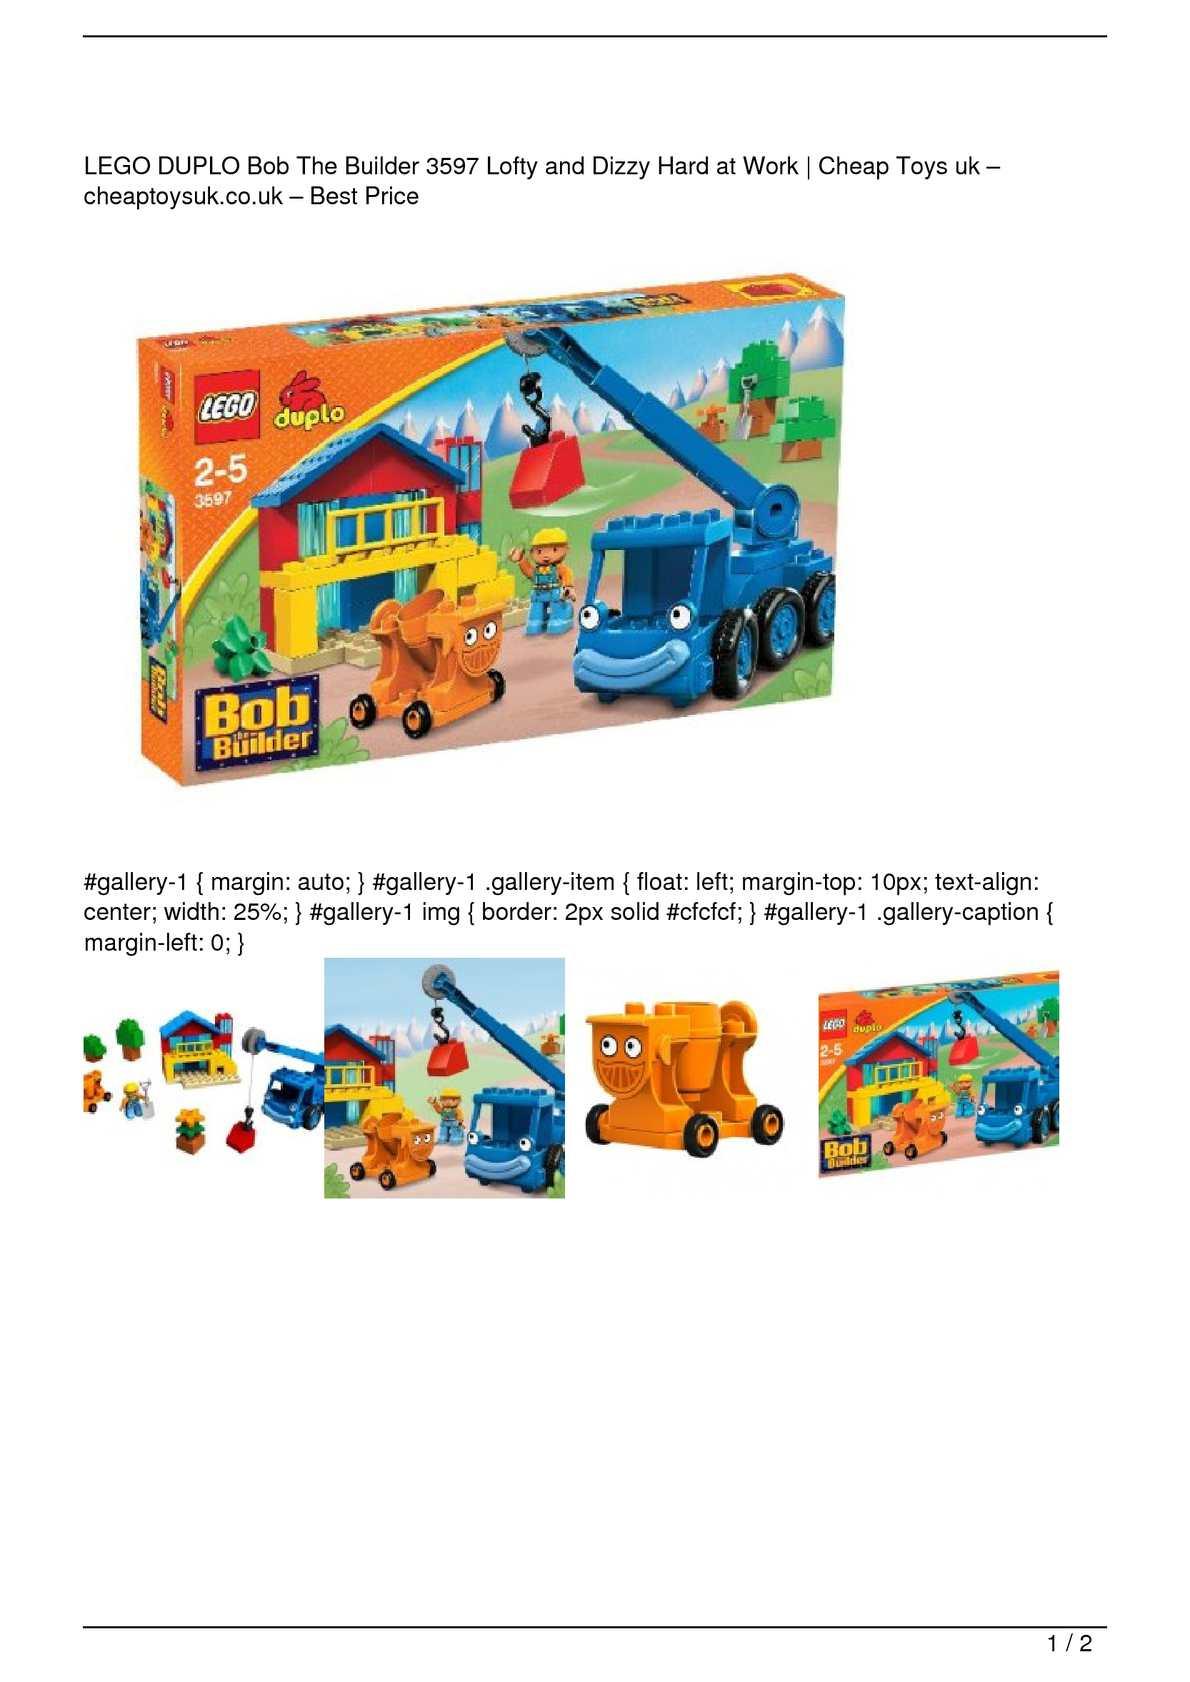 Calaméo Lego Duplo Bob The Builder 3597 Lofty And Dizzy Hard At